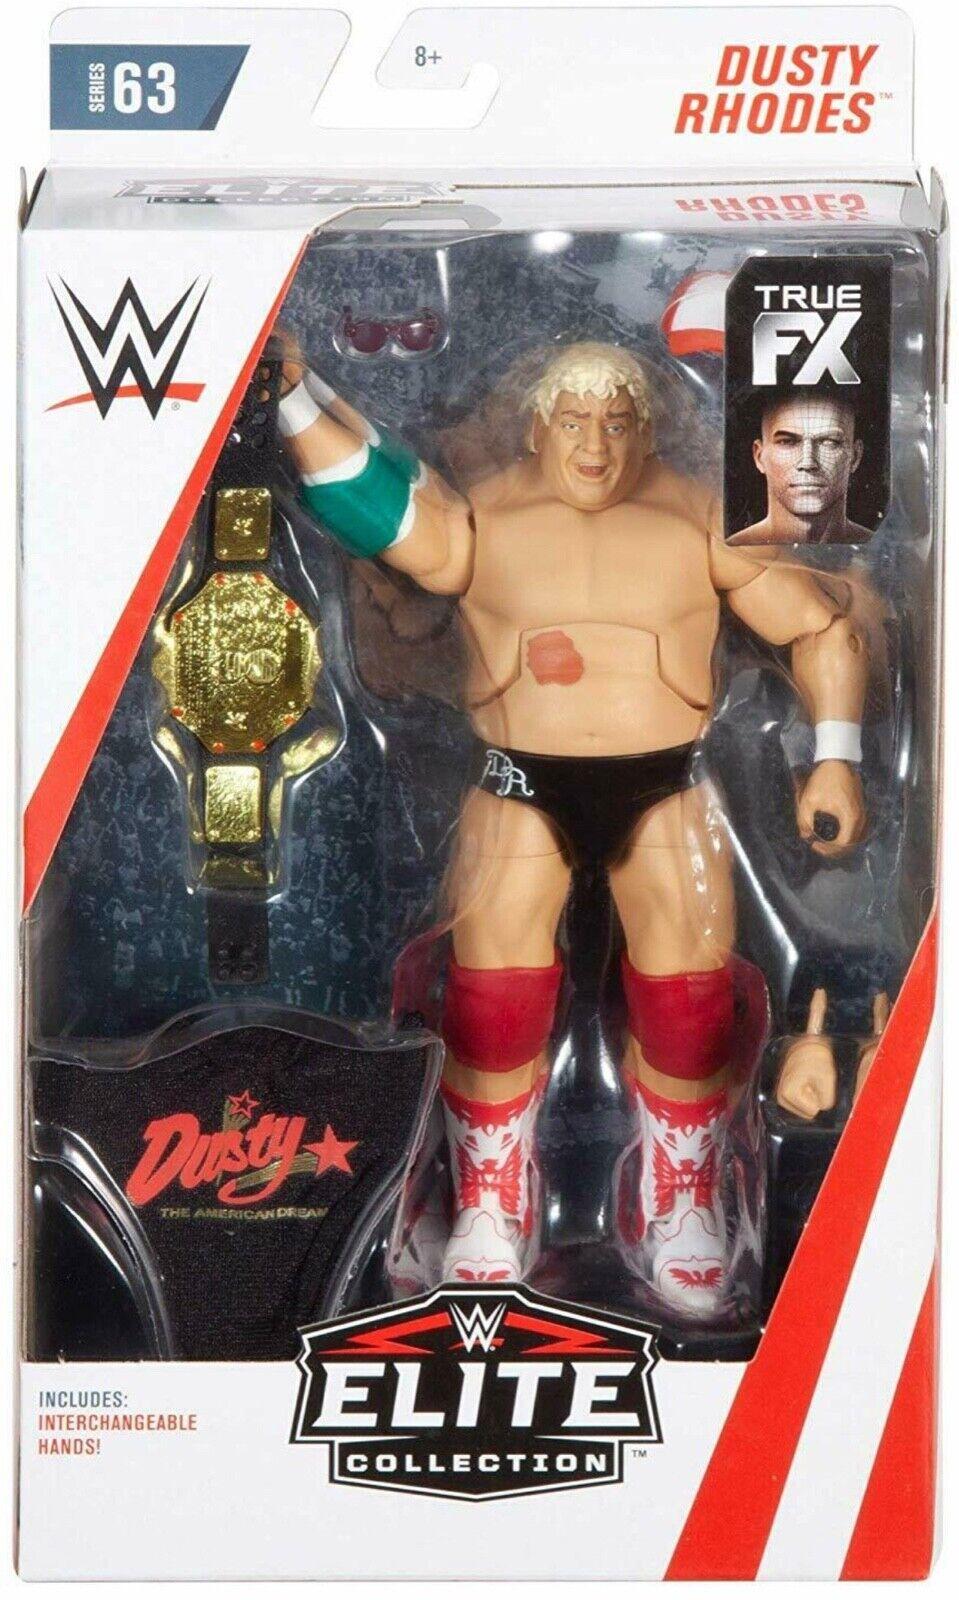 Wwe Dusty Rodi Fx Cintura Accessori Mattel Mattel Mattel Serie Élite 63 Wrestling cifra Nxt c54286